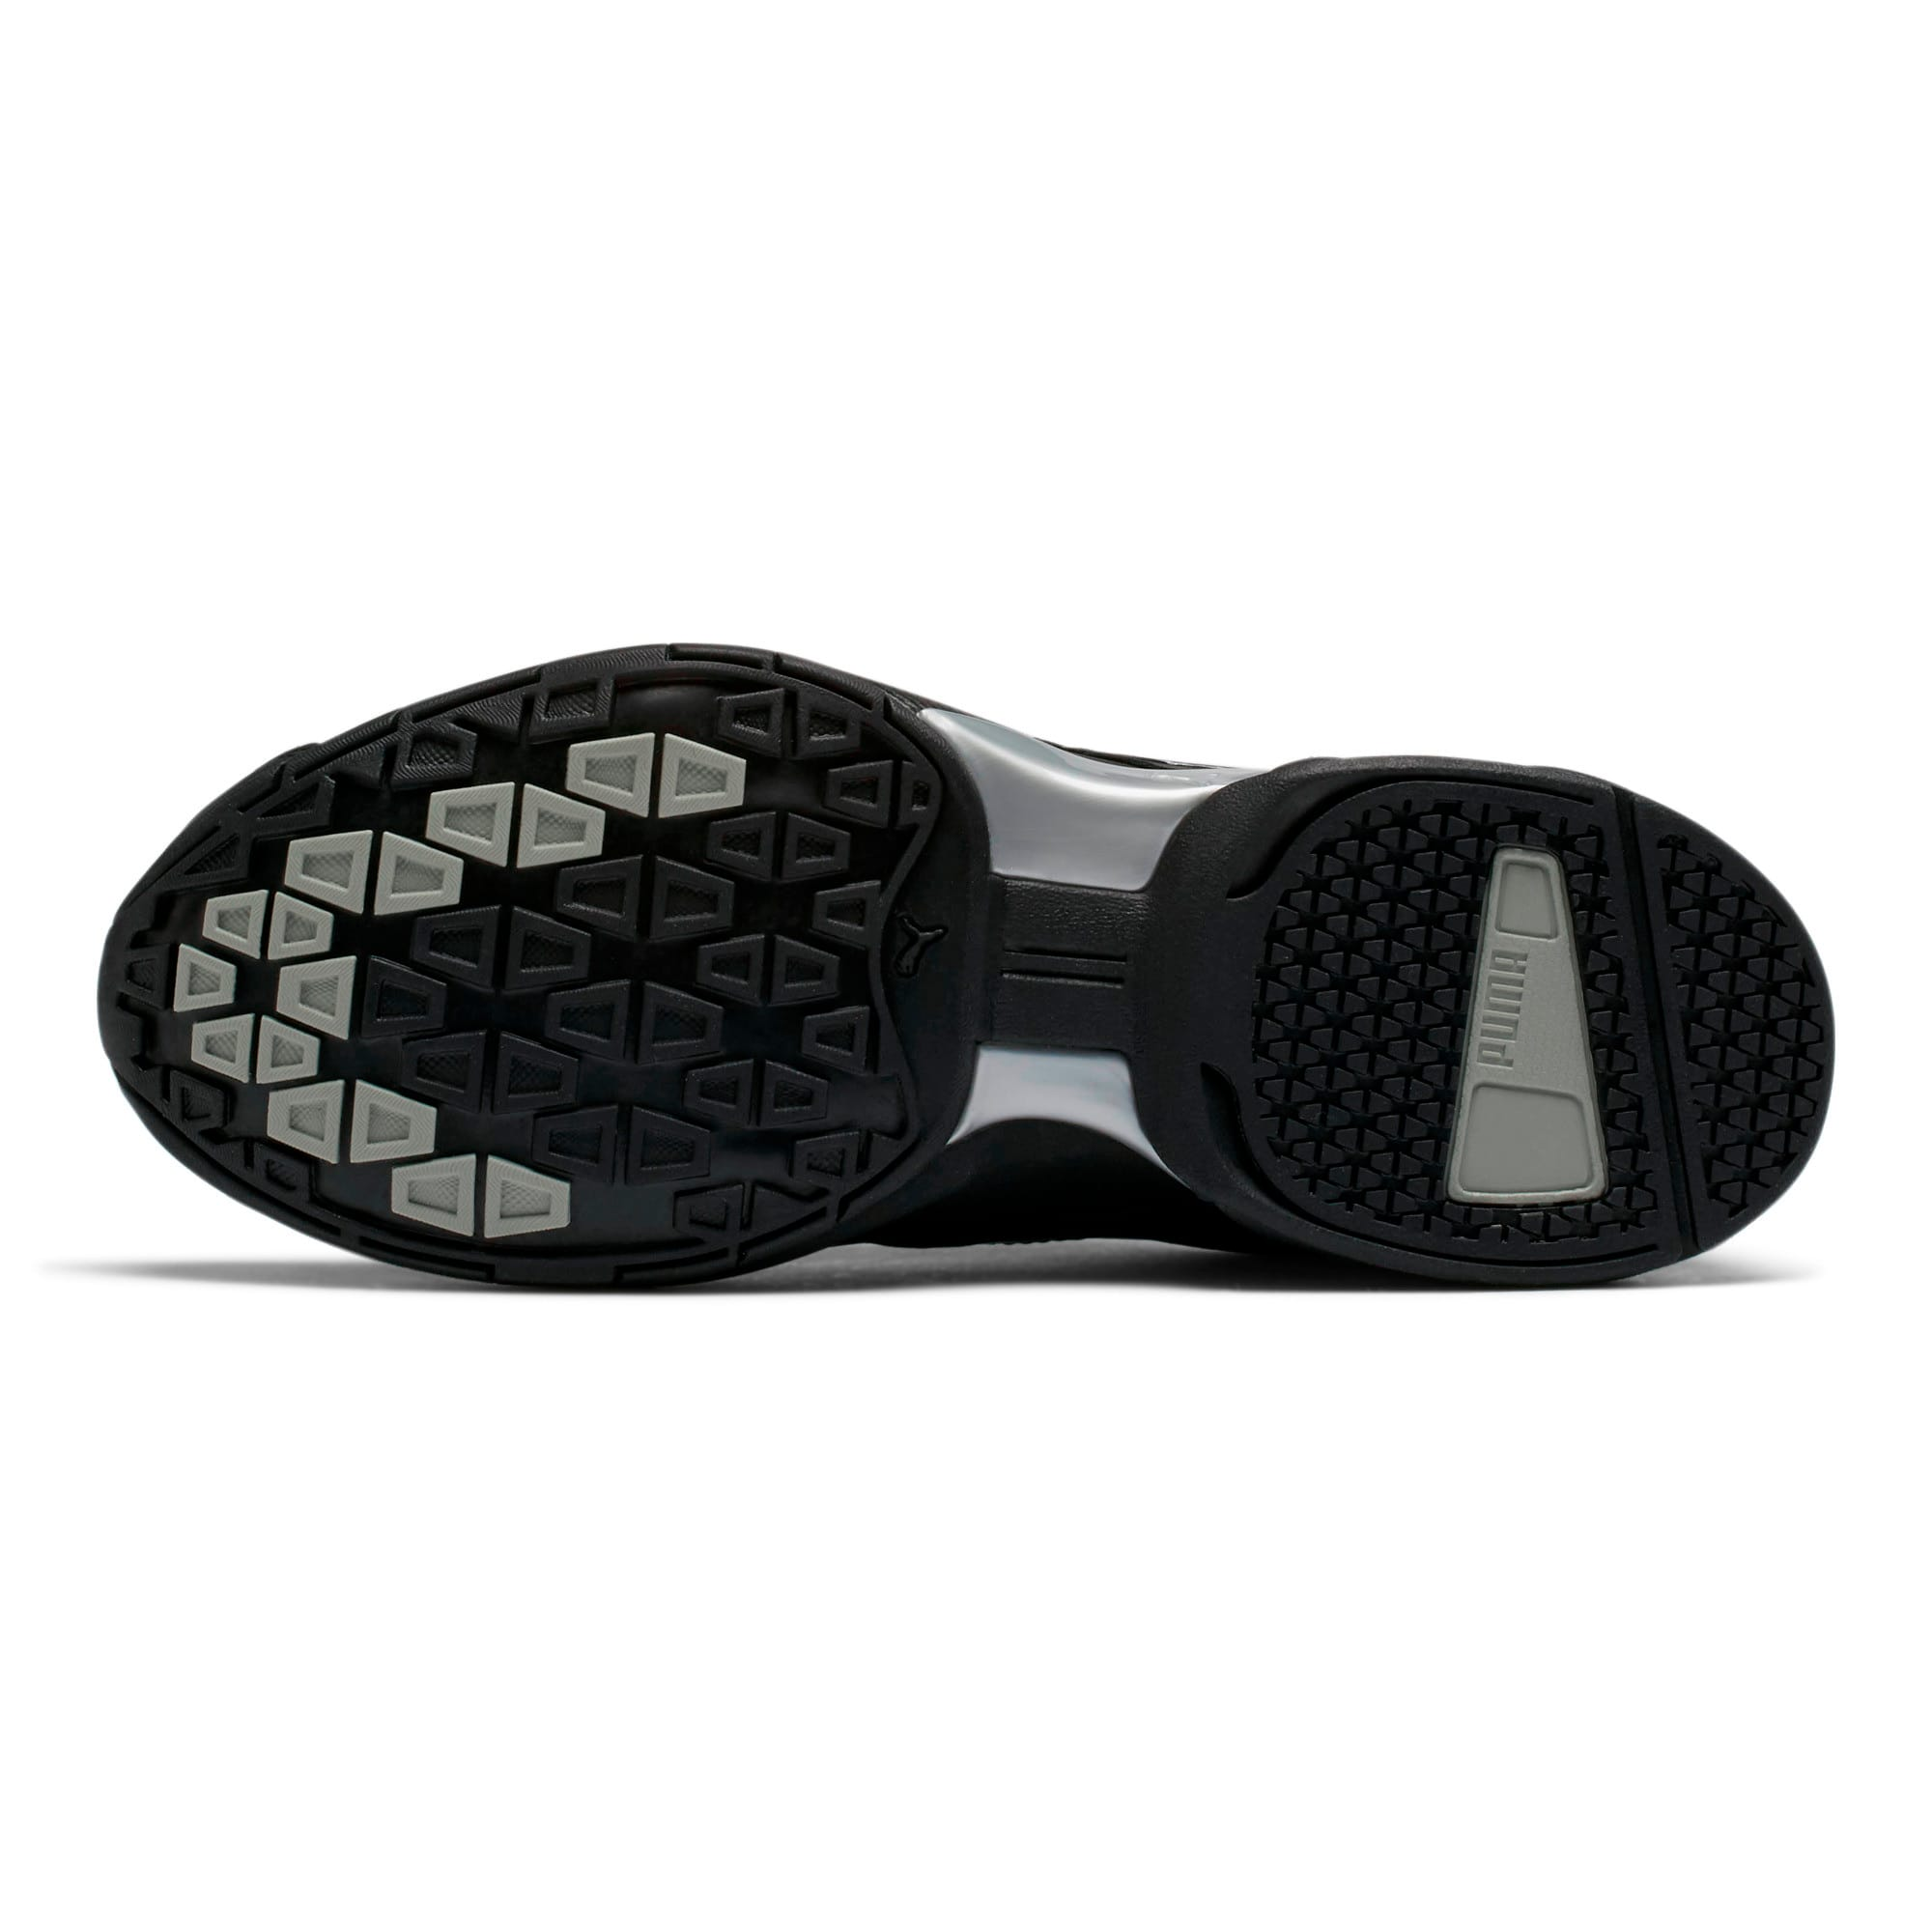 Thumbnail 4 of Tazon 6 FM Men's Sneakers, Puma Black-puma silver, medium